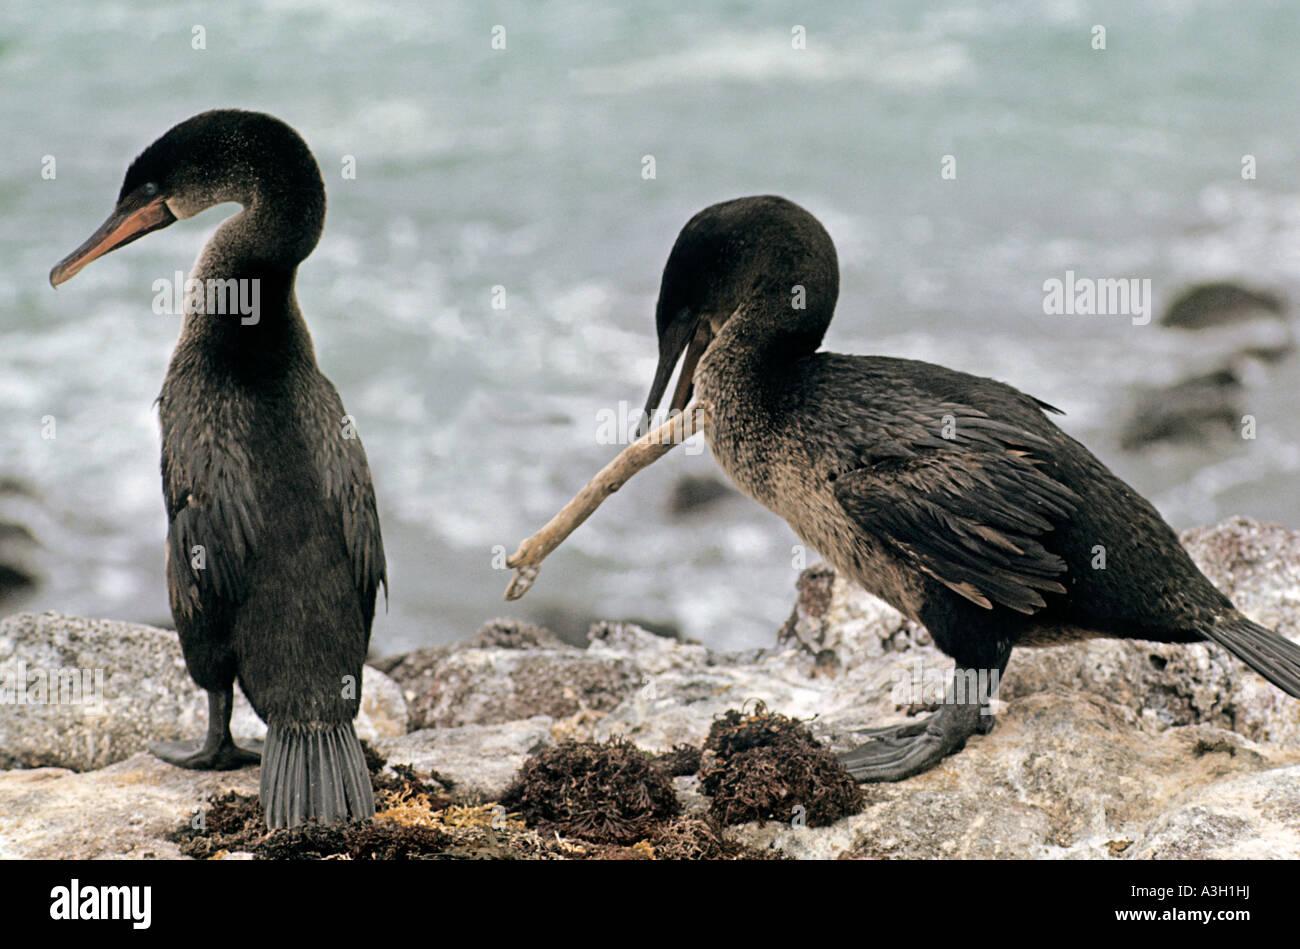 Flightless Galapagos Cormorants Phalacrocorax harrisi Galapagos Islands - Stock Image